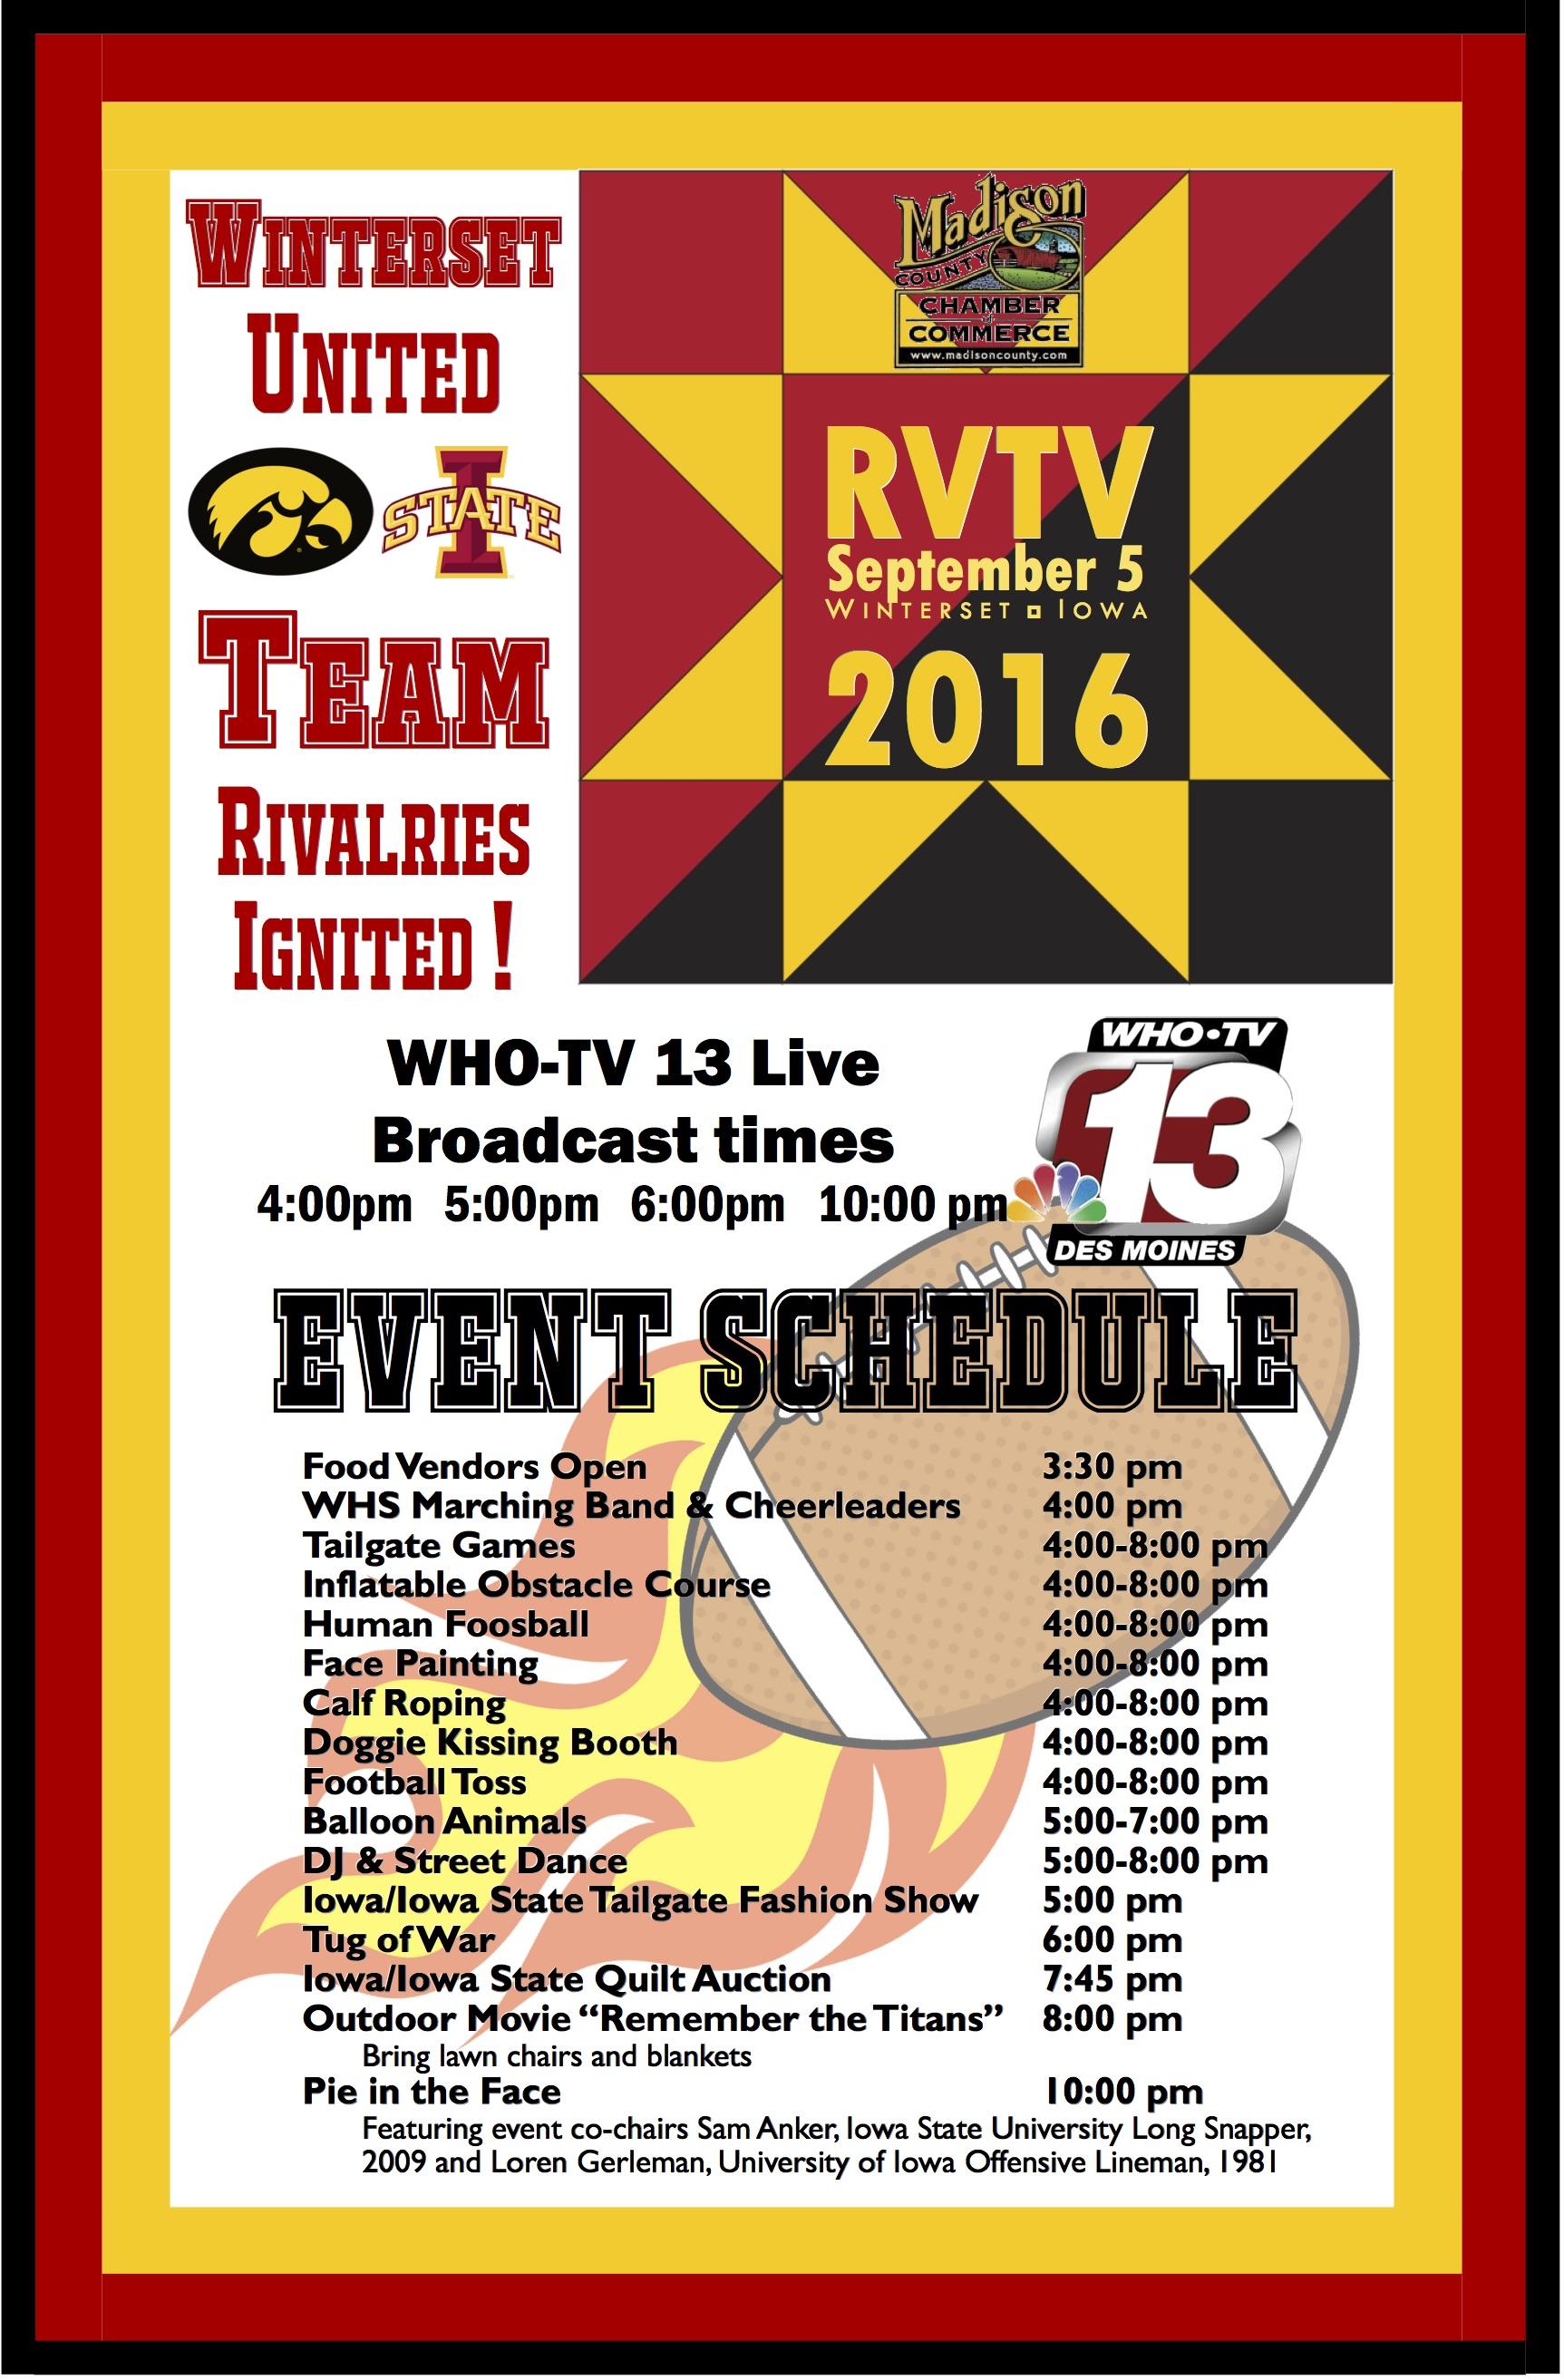 RVTV Poster2